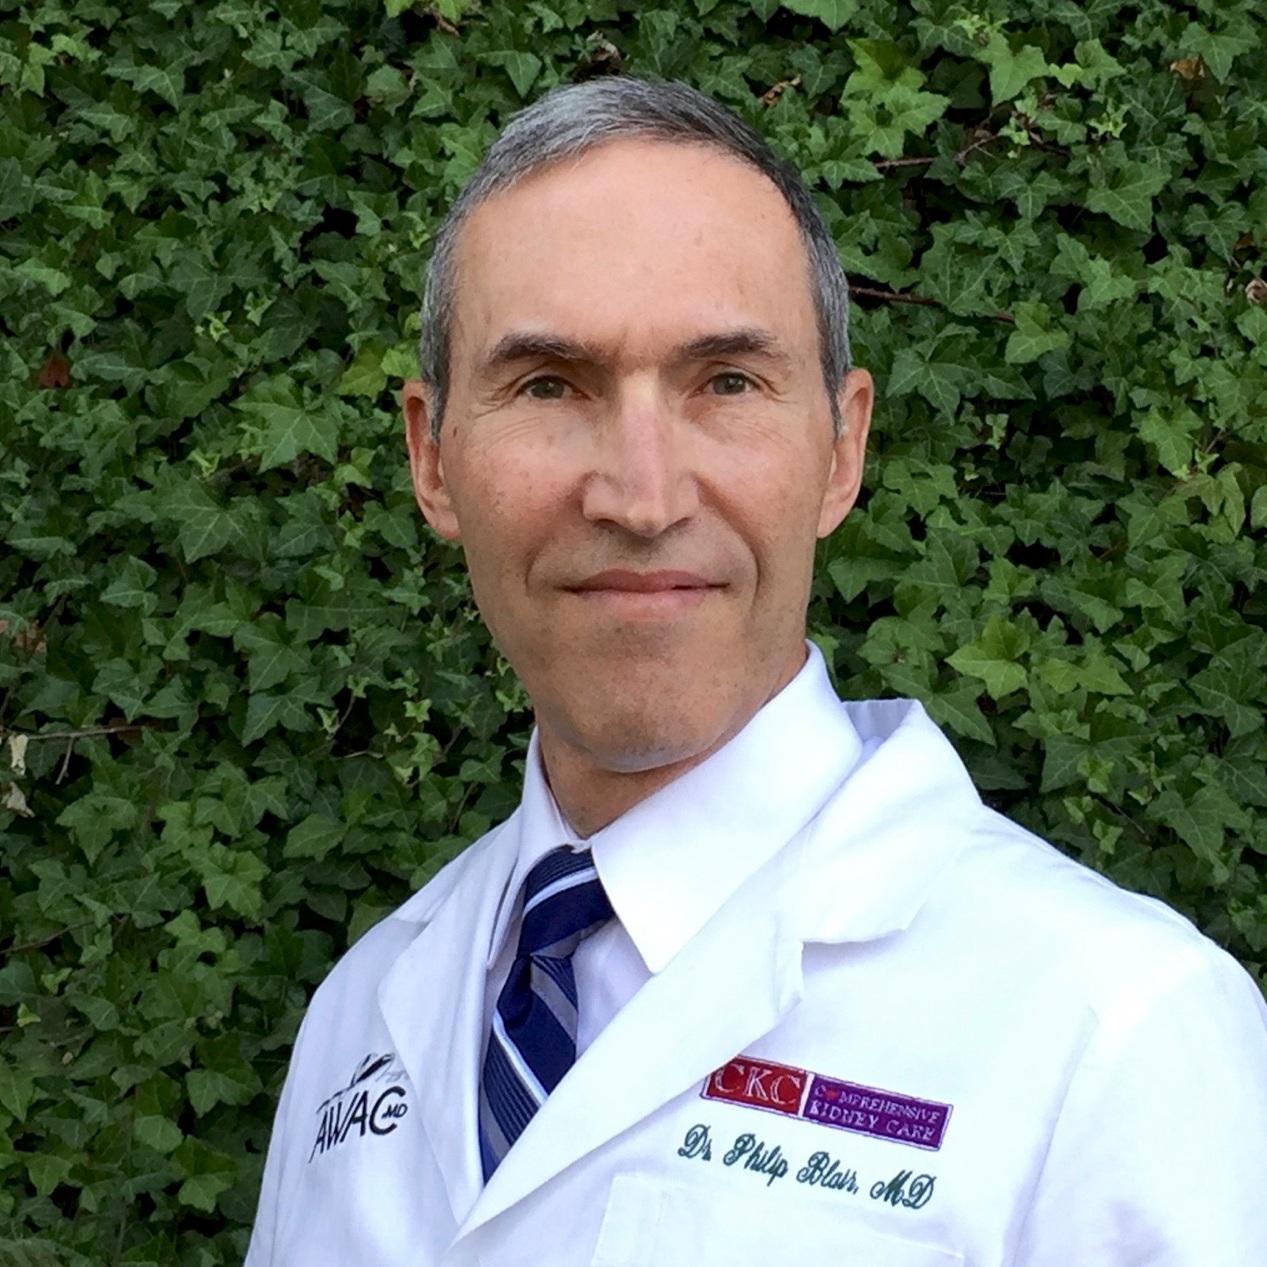 Dr. Philip Blair - Medical Doctor, Hemp & CBD Speaker and Expert, Elixinol